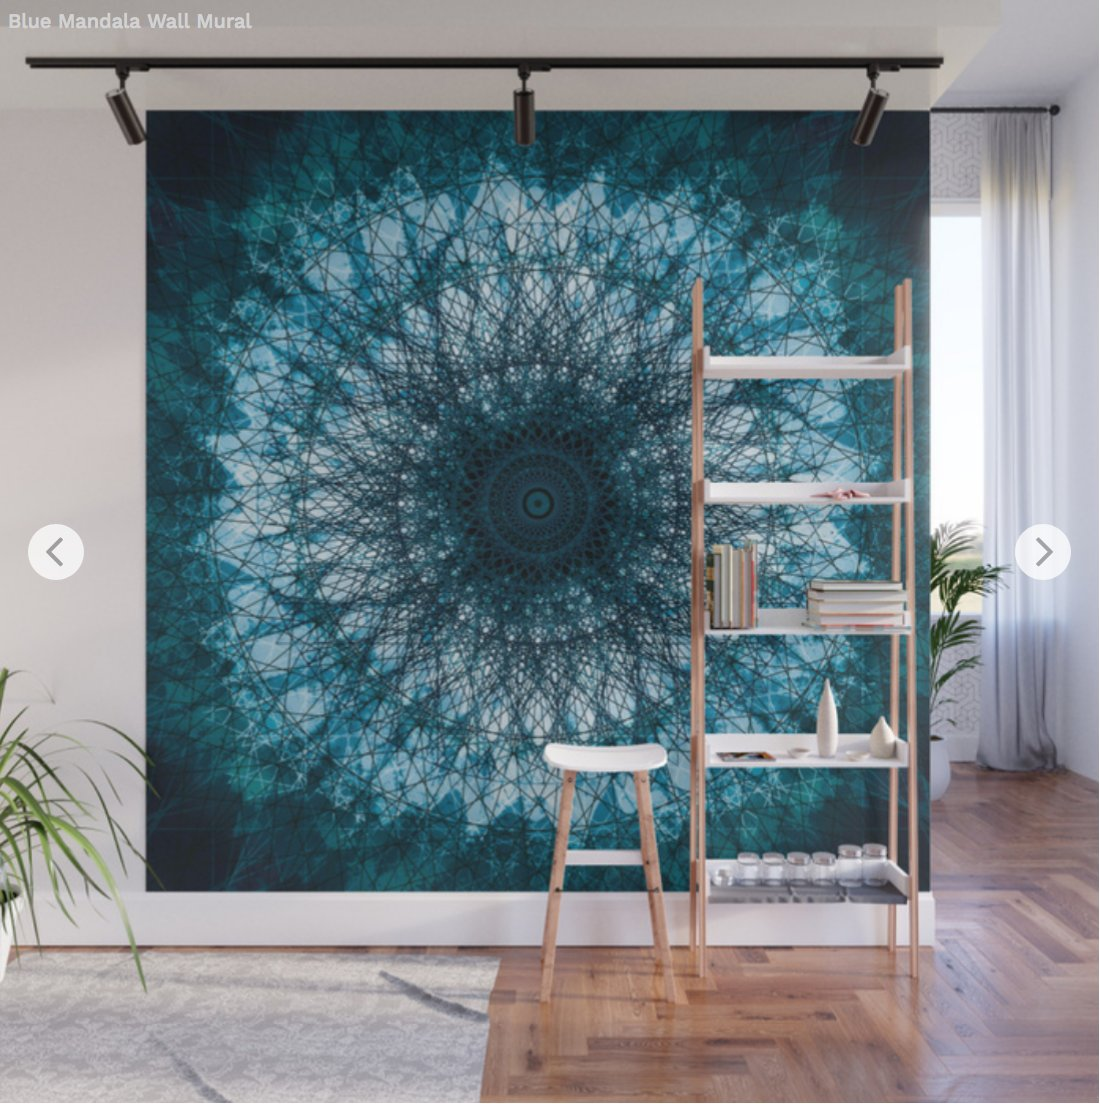 Get The Beautiful Blue Mandala Wall Mural At My Shop Society6 Product Mandala809131 Muralskus6 7771454p68a215v760